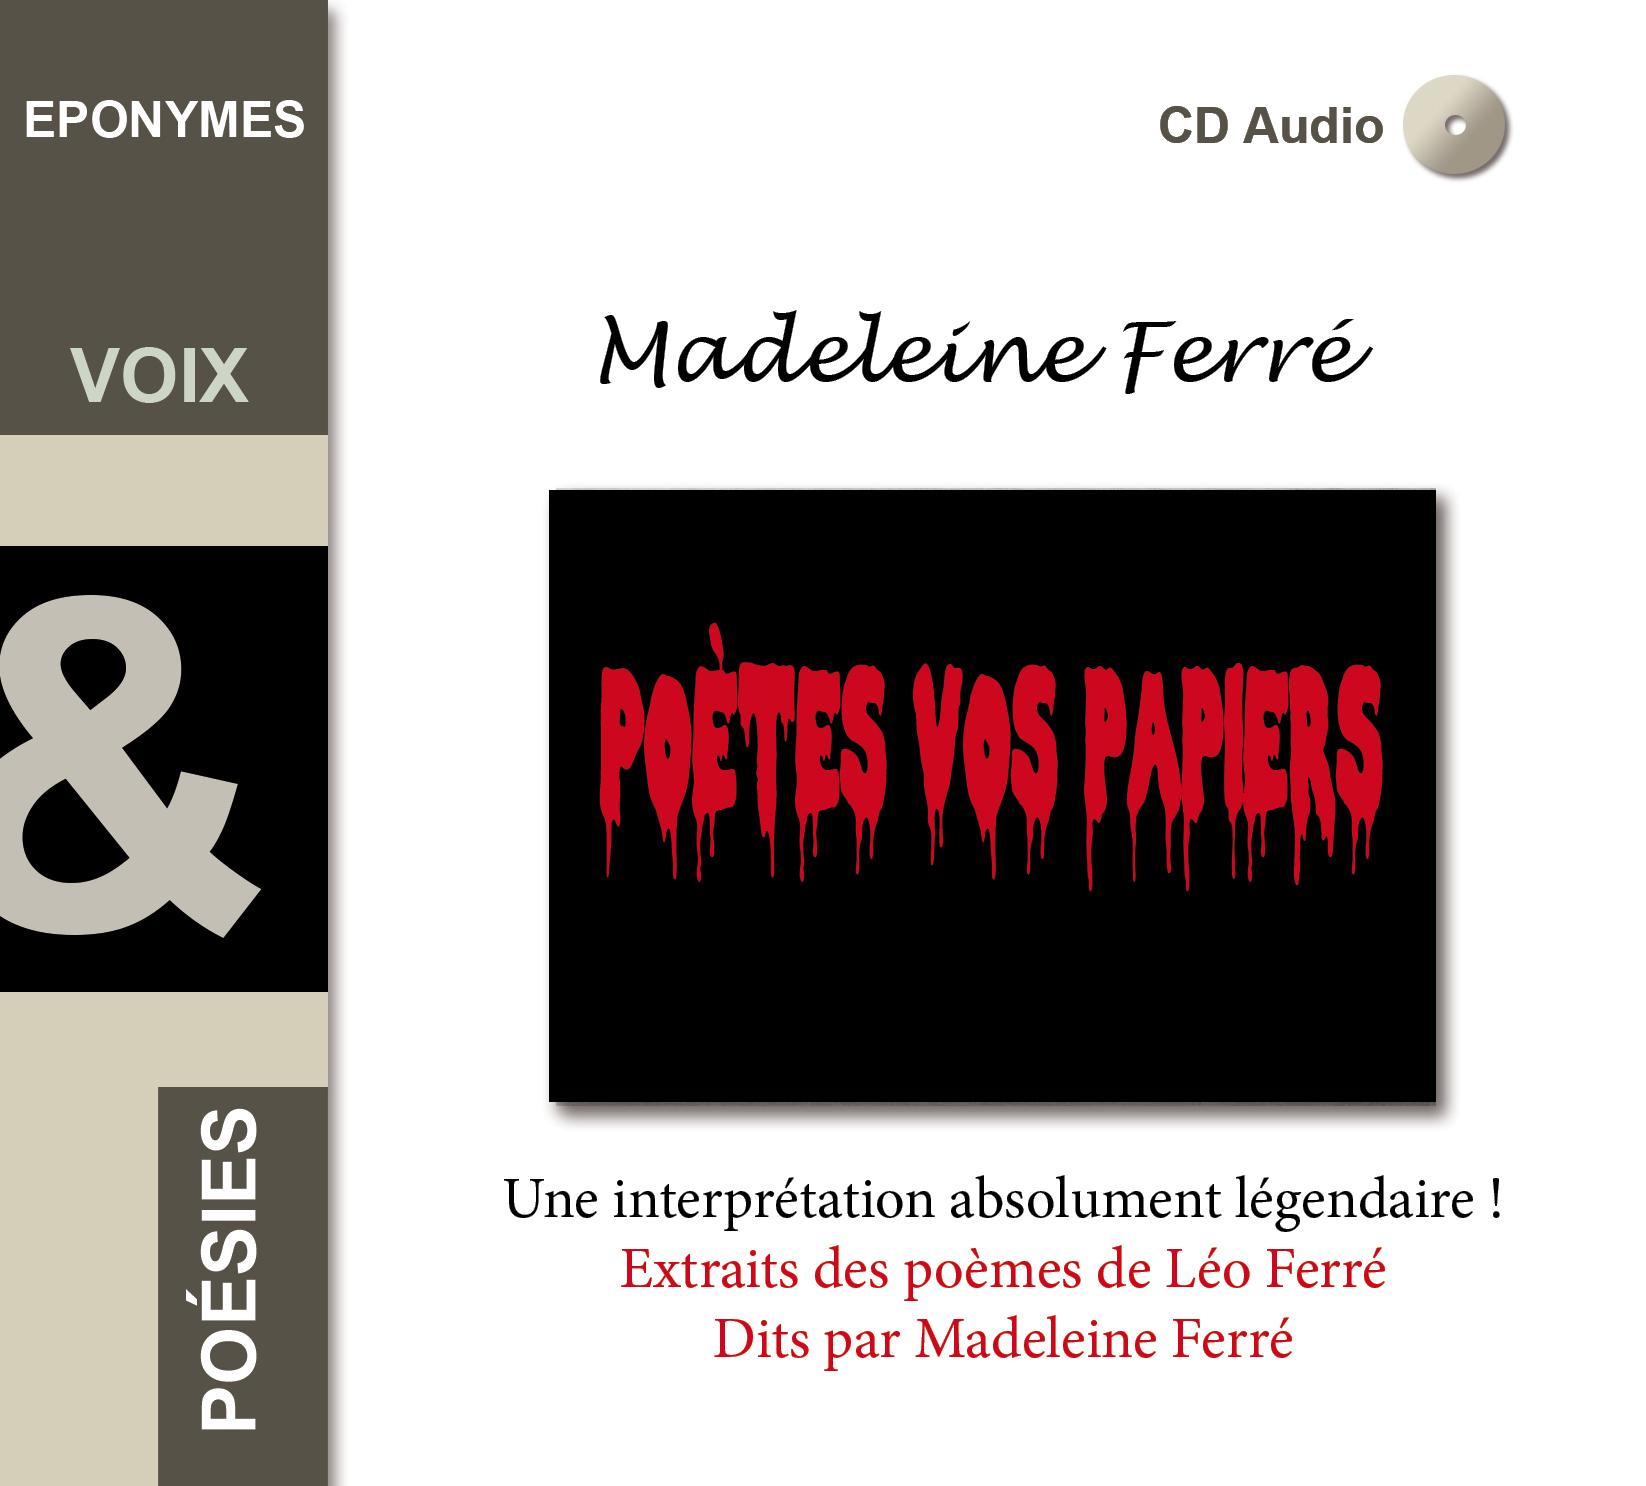 MADELEINE FERRE POETES VOS PAPIERS